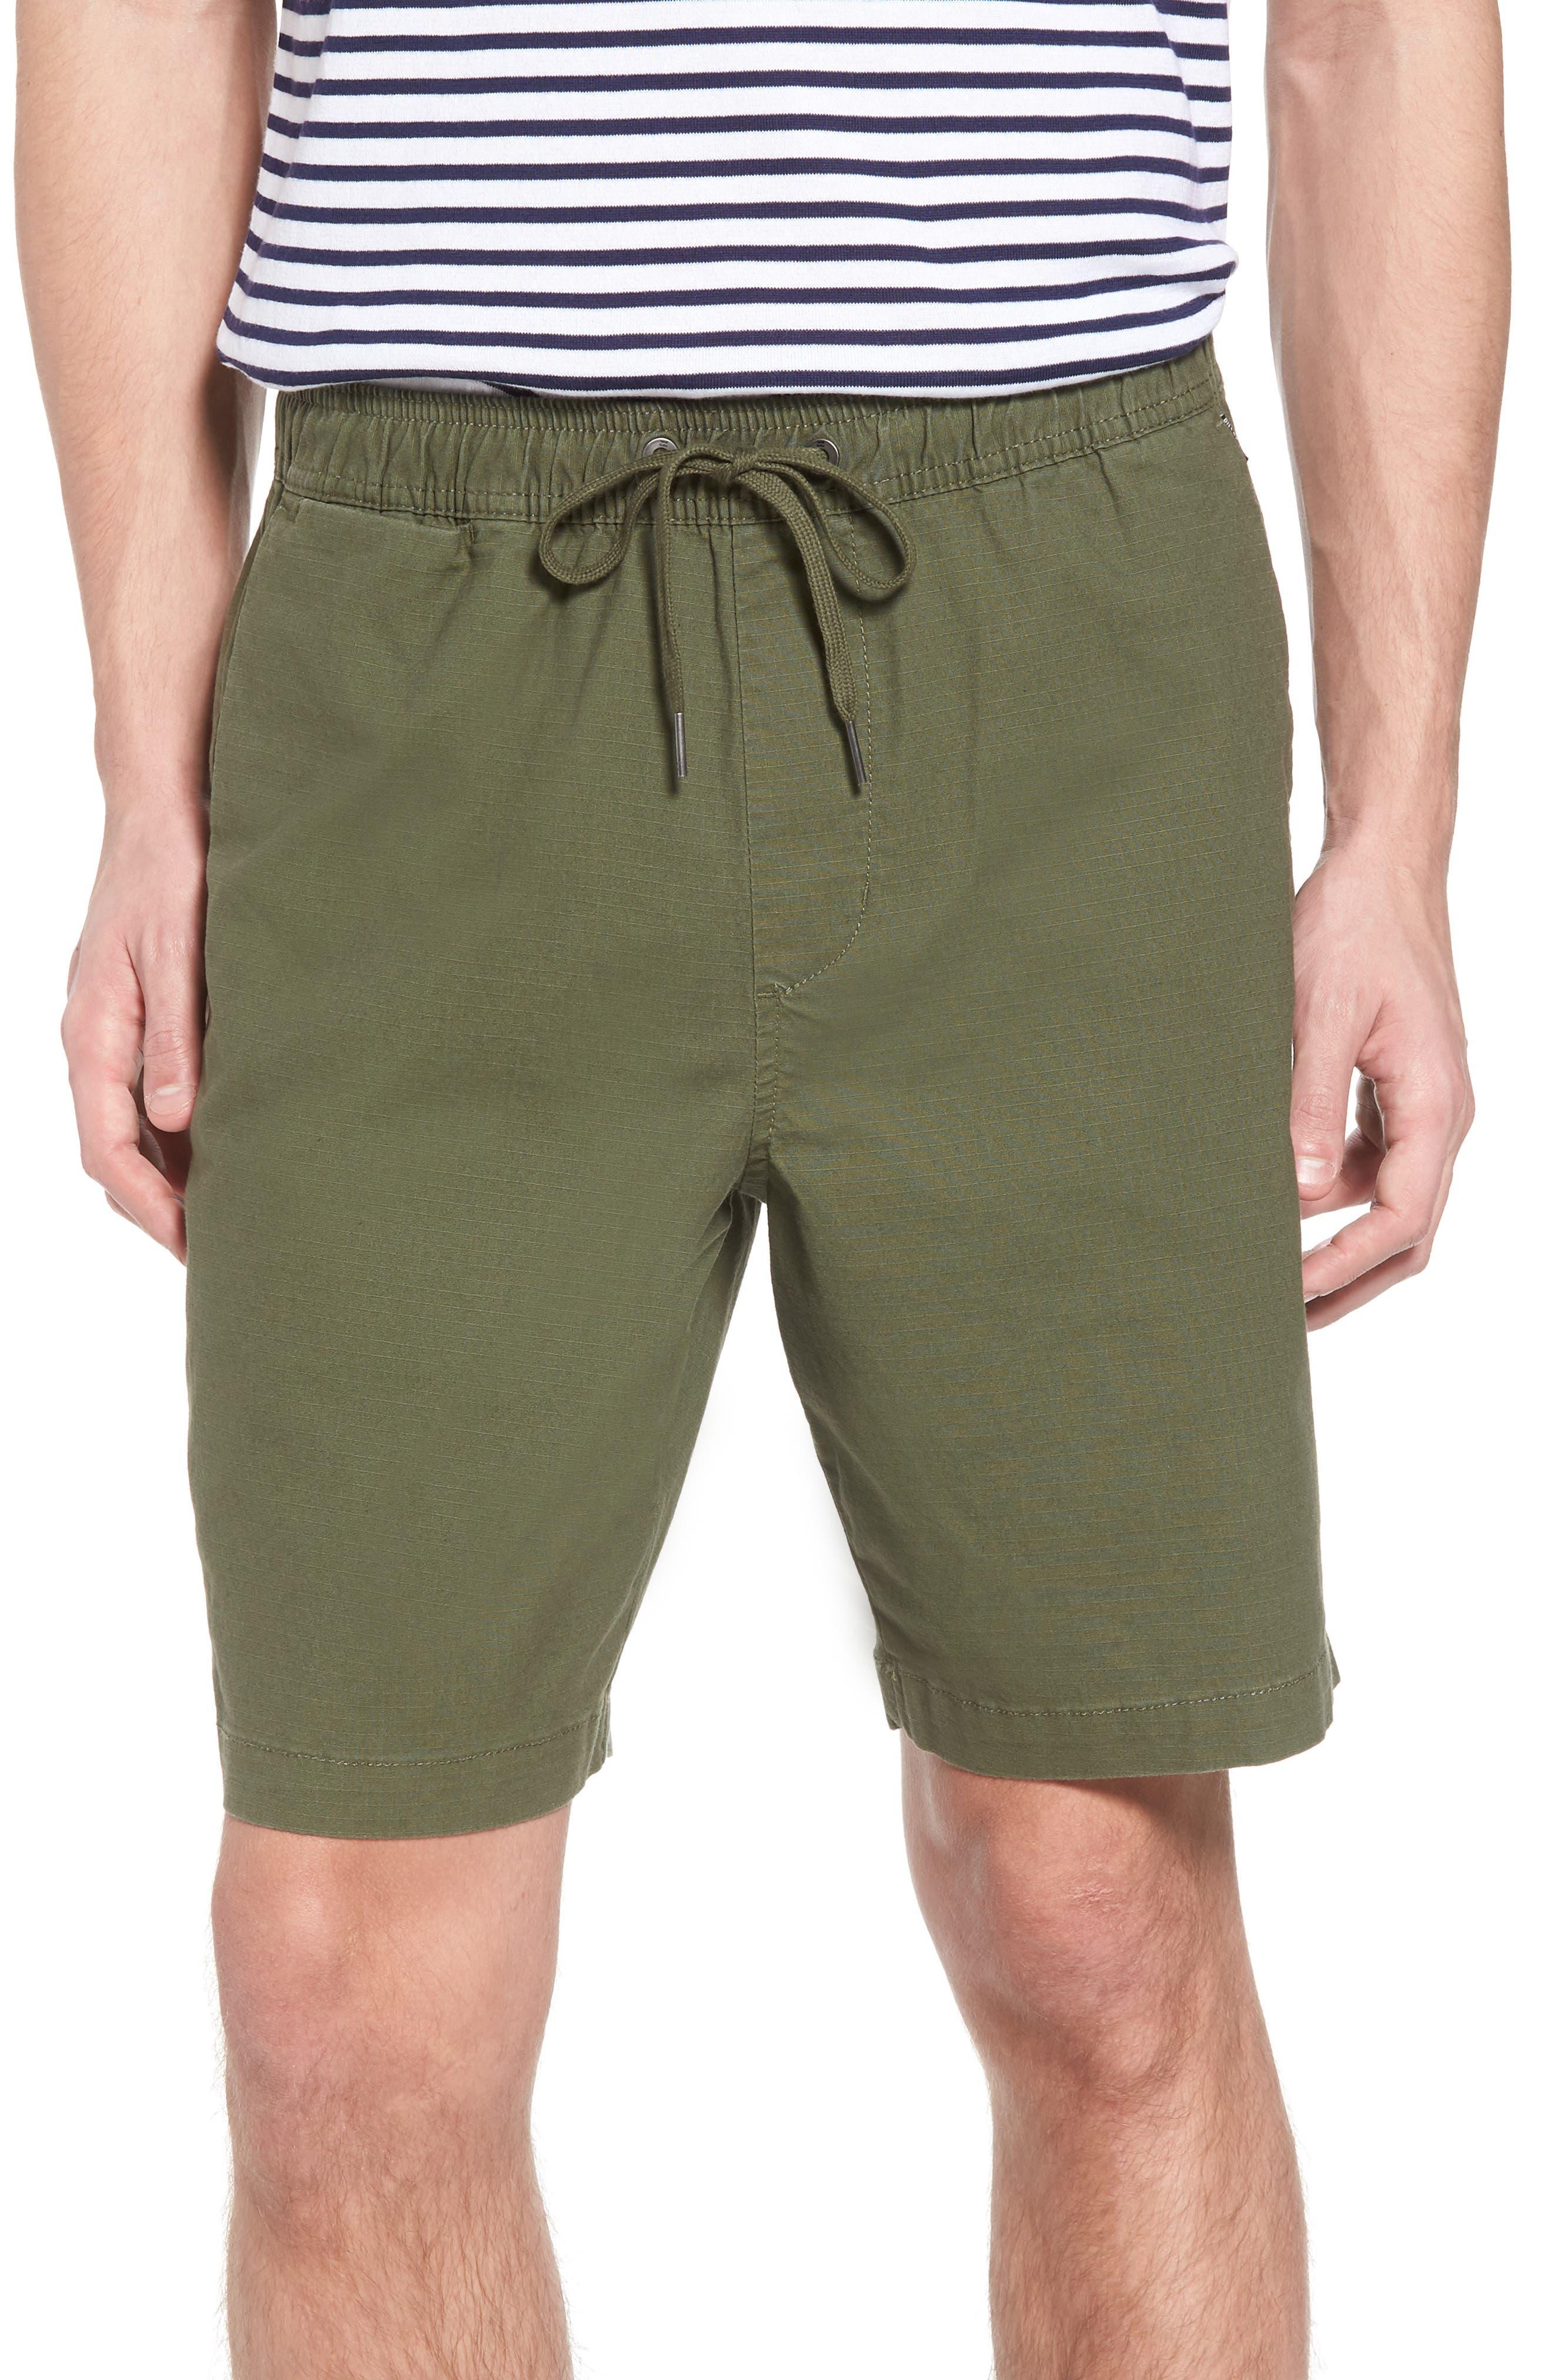 Larry Layback Shorts,                             Main thumbnail 1, color,                             Dark Olive